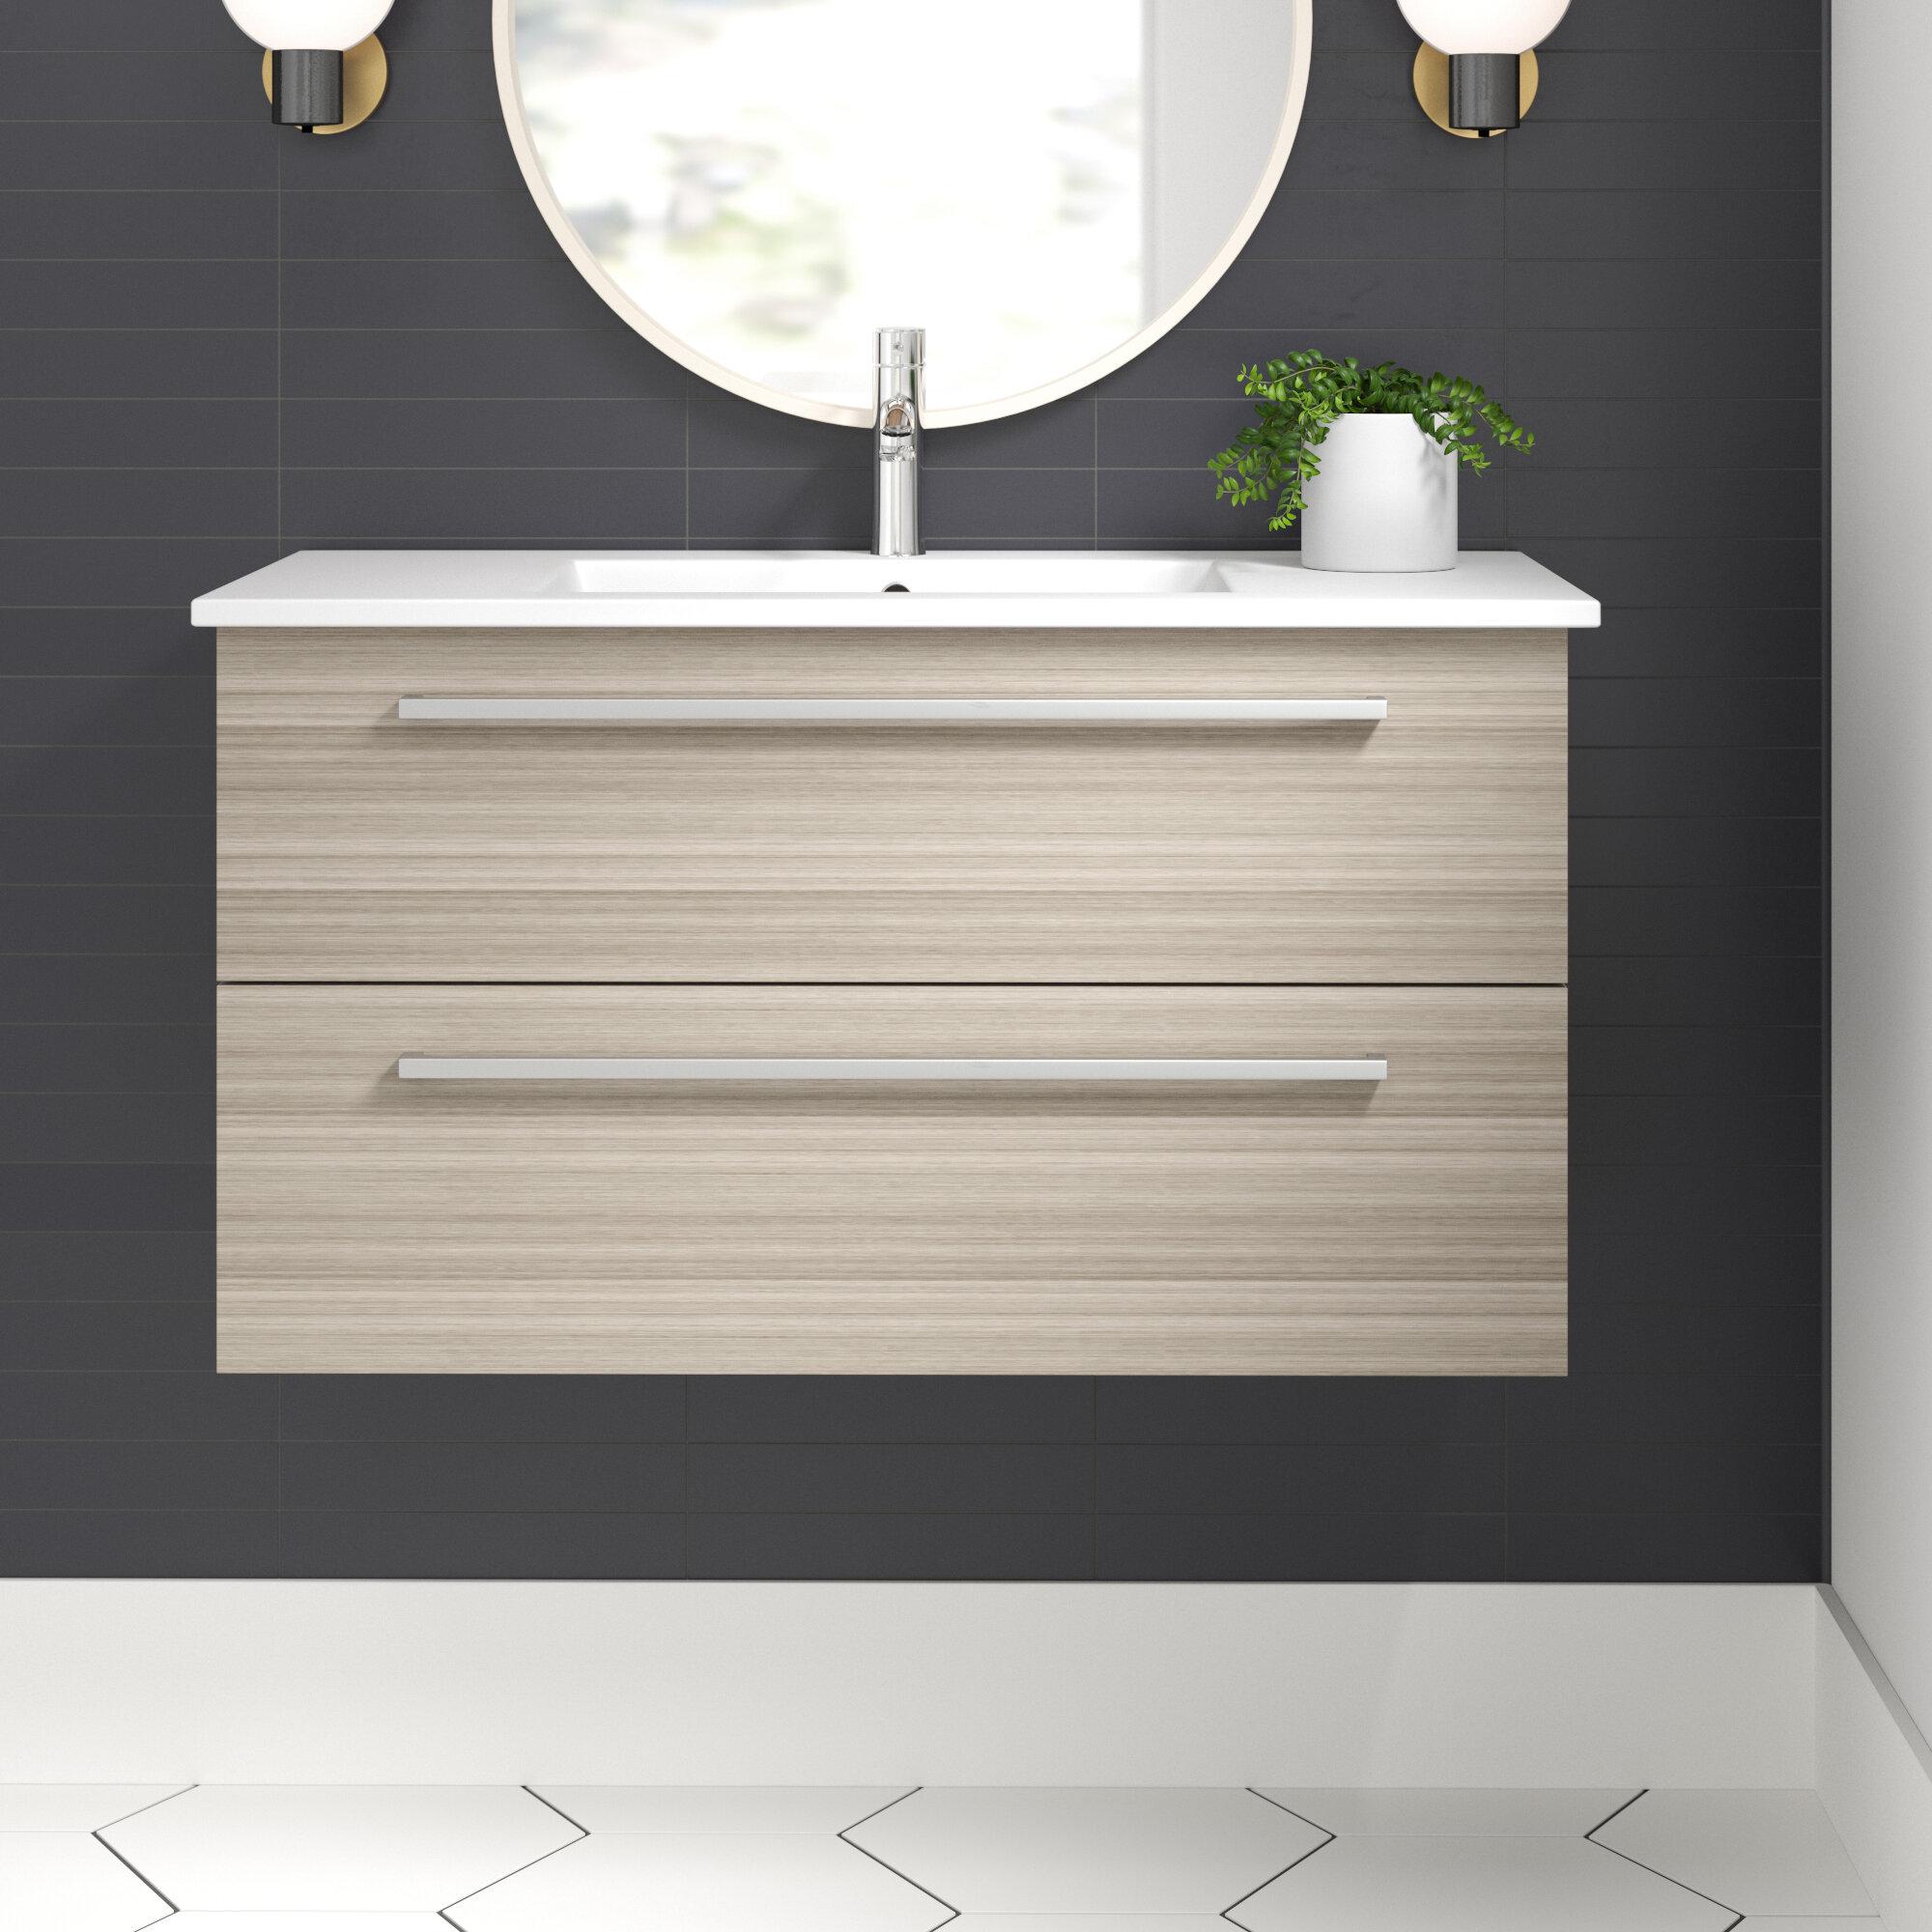 Wall Mounted Floating Bathroom Vanities Free Shipping Over 35 Wayfair